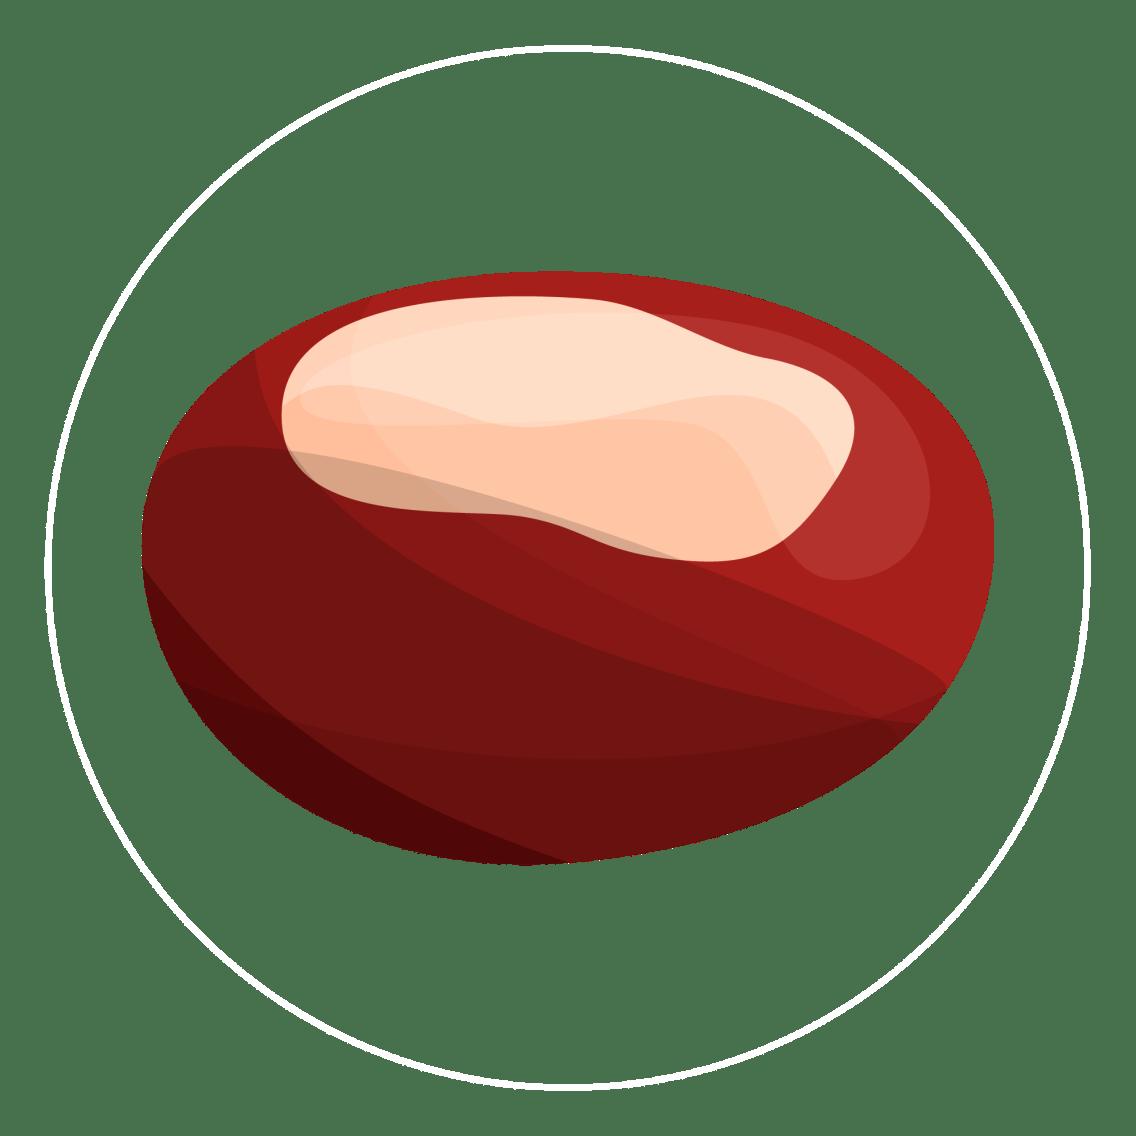 chestnut-icon